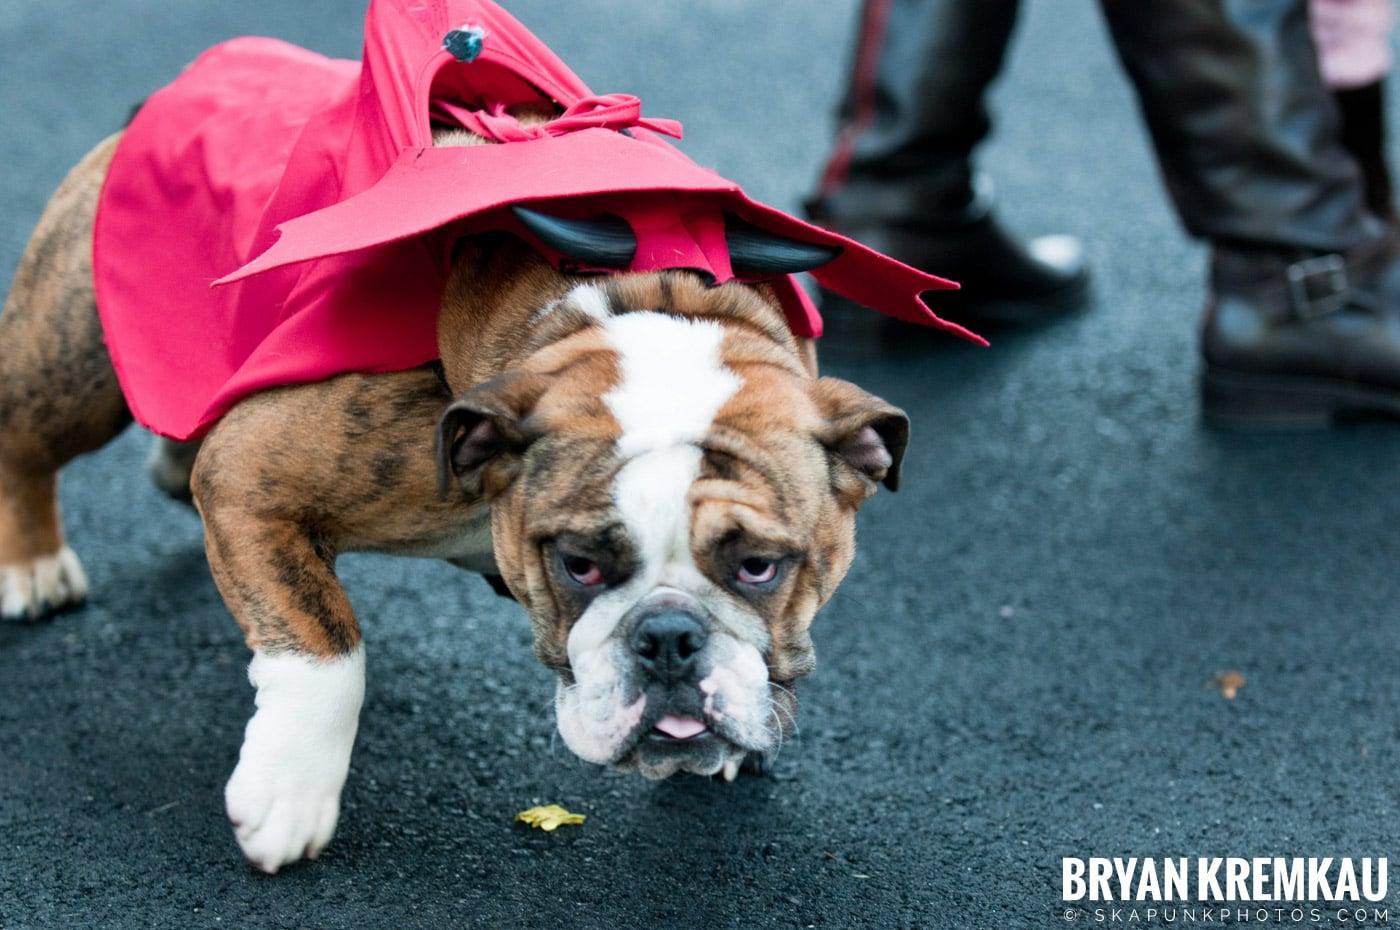 Paulus Hook Halloween Pet Parade 2011 @ Jersey City, NJ - 10.30.11 (44)